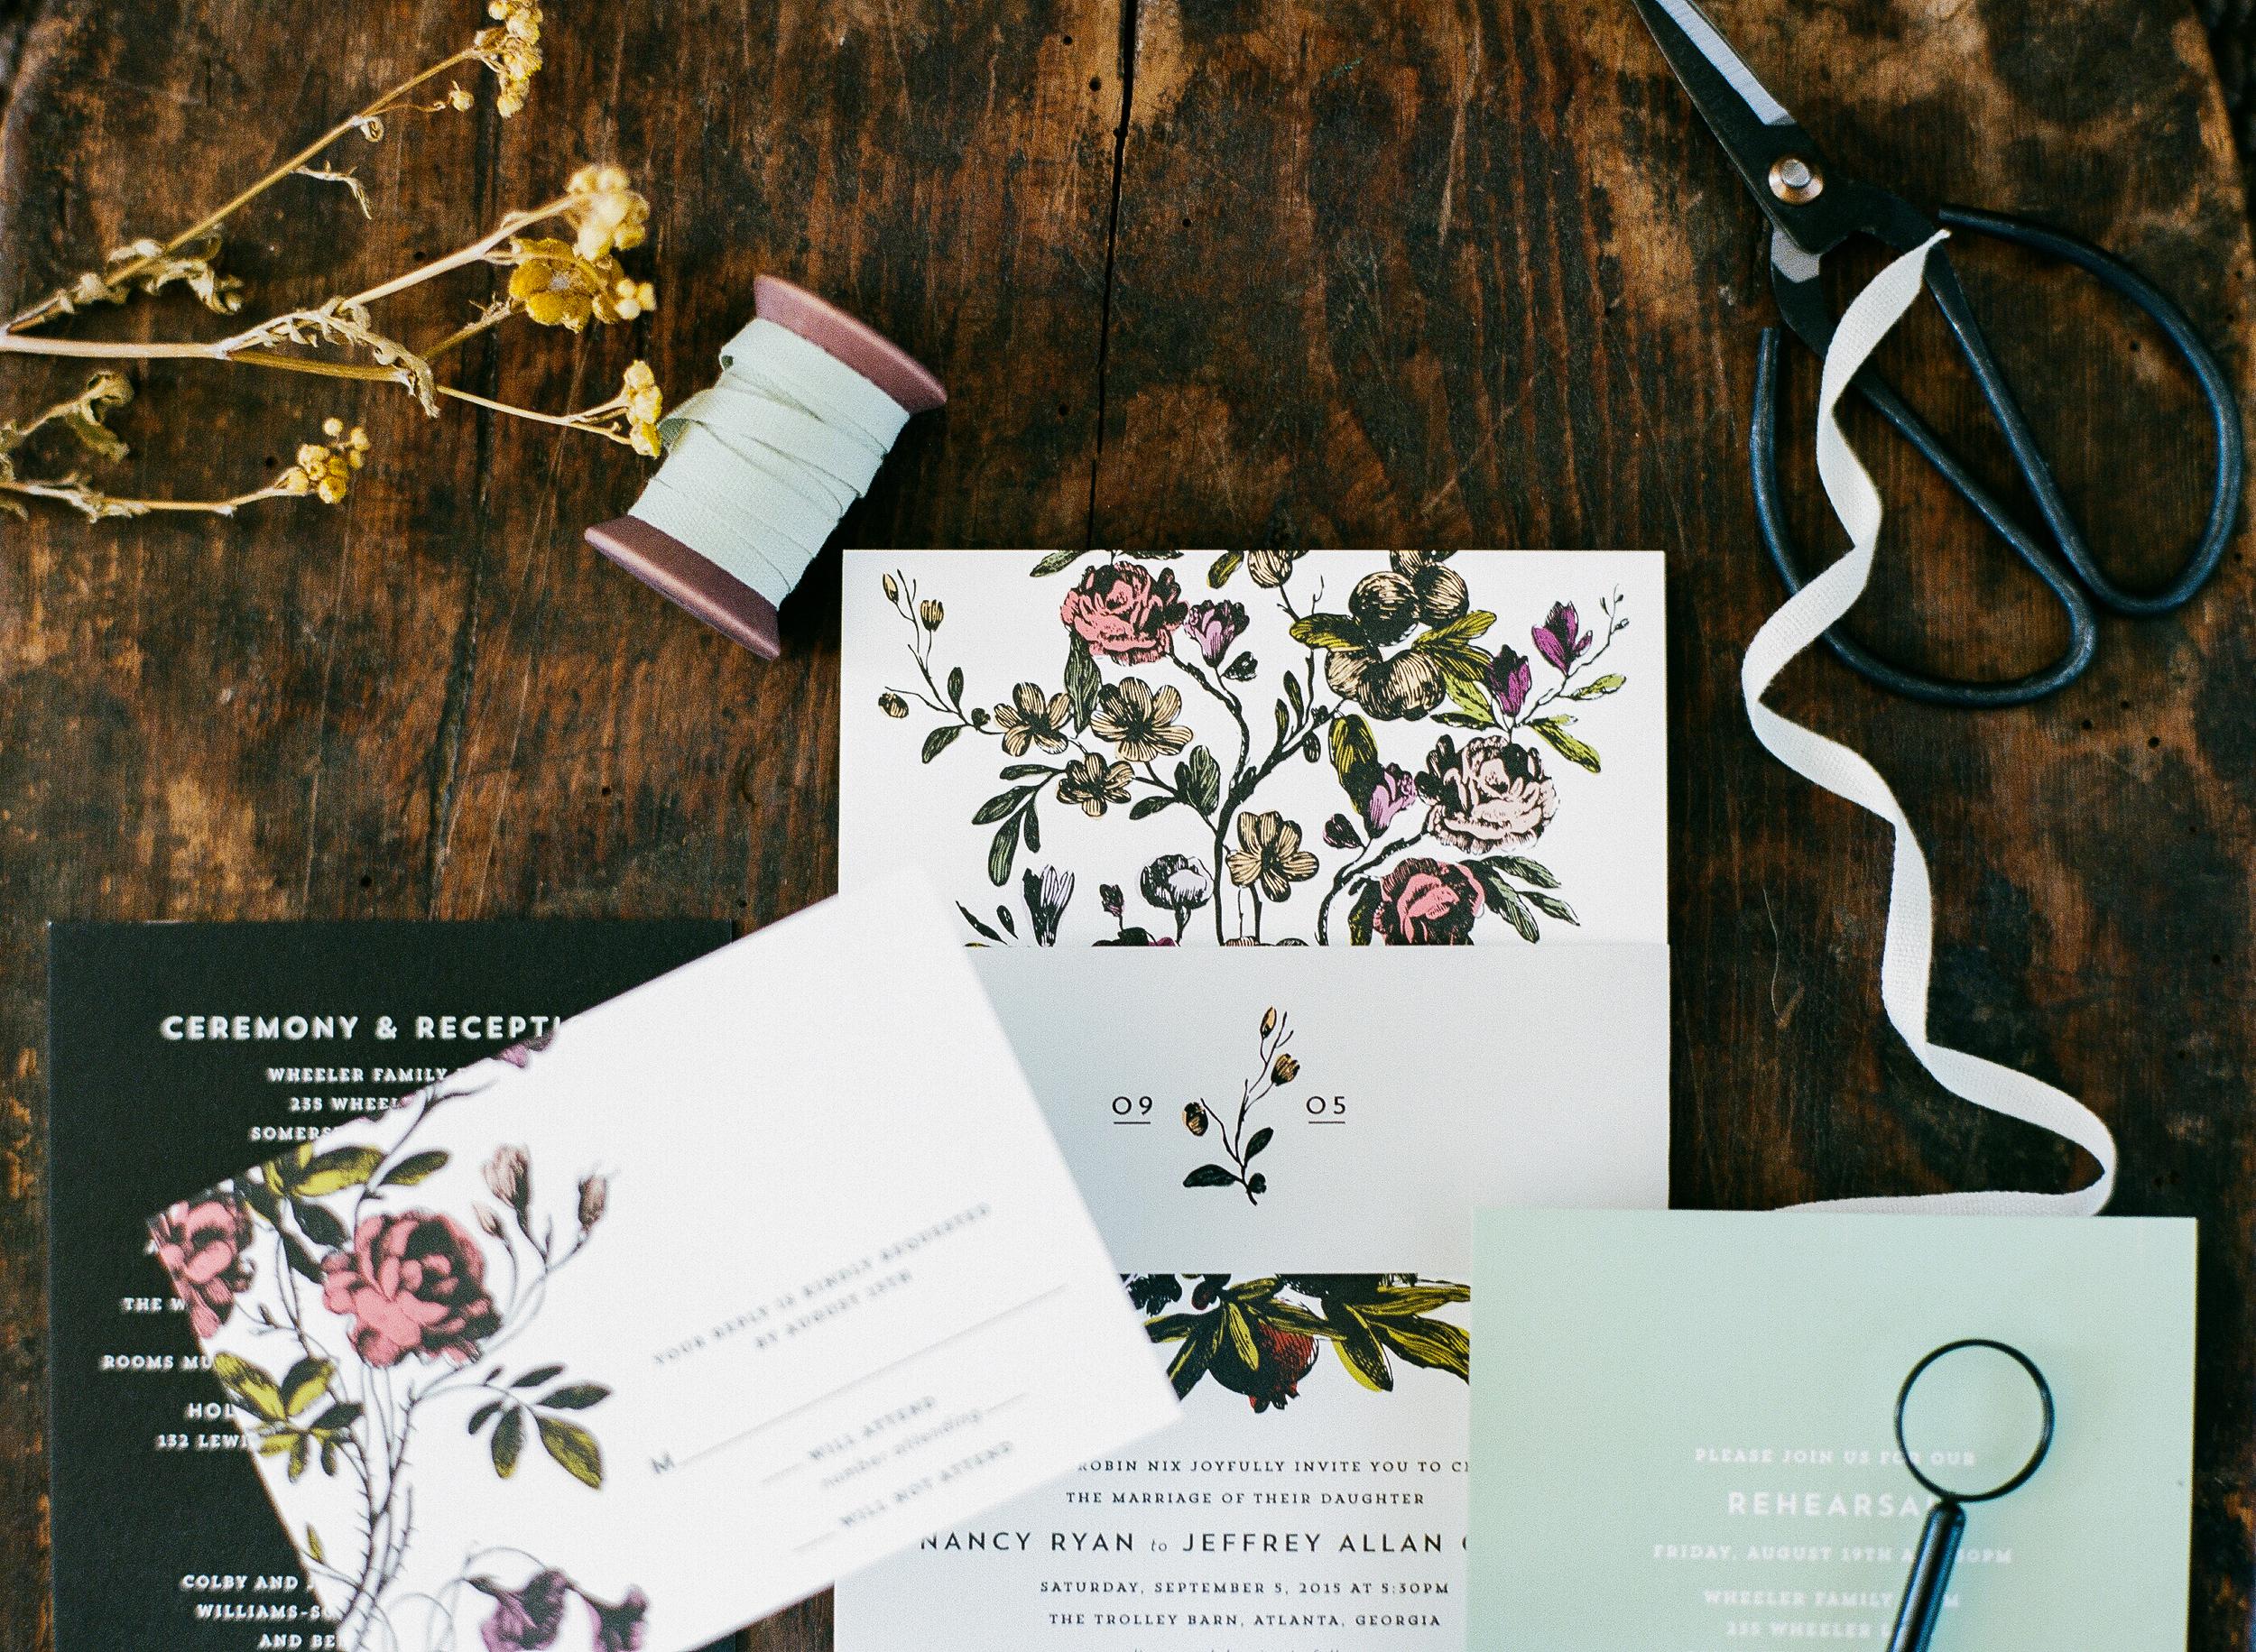 010-floral-wedding-invitations-hellotenfold.jpg